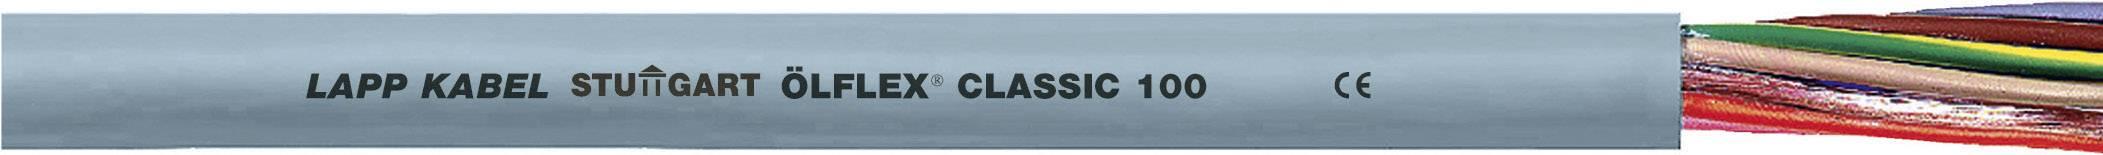 Kabel LappKabel Ölflex CLASSIC 100 5X0,5 (00101244), PVC, 6,2 mm, 500 V, šedá, 500 m